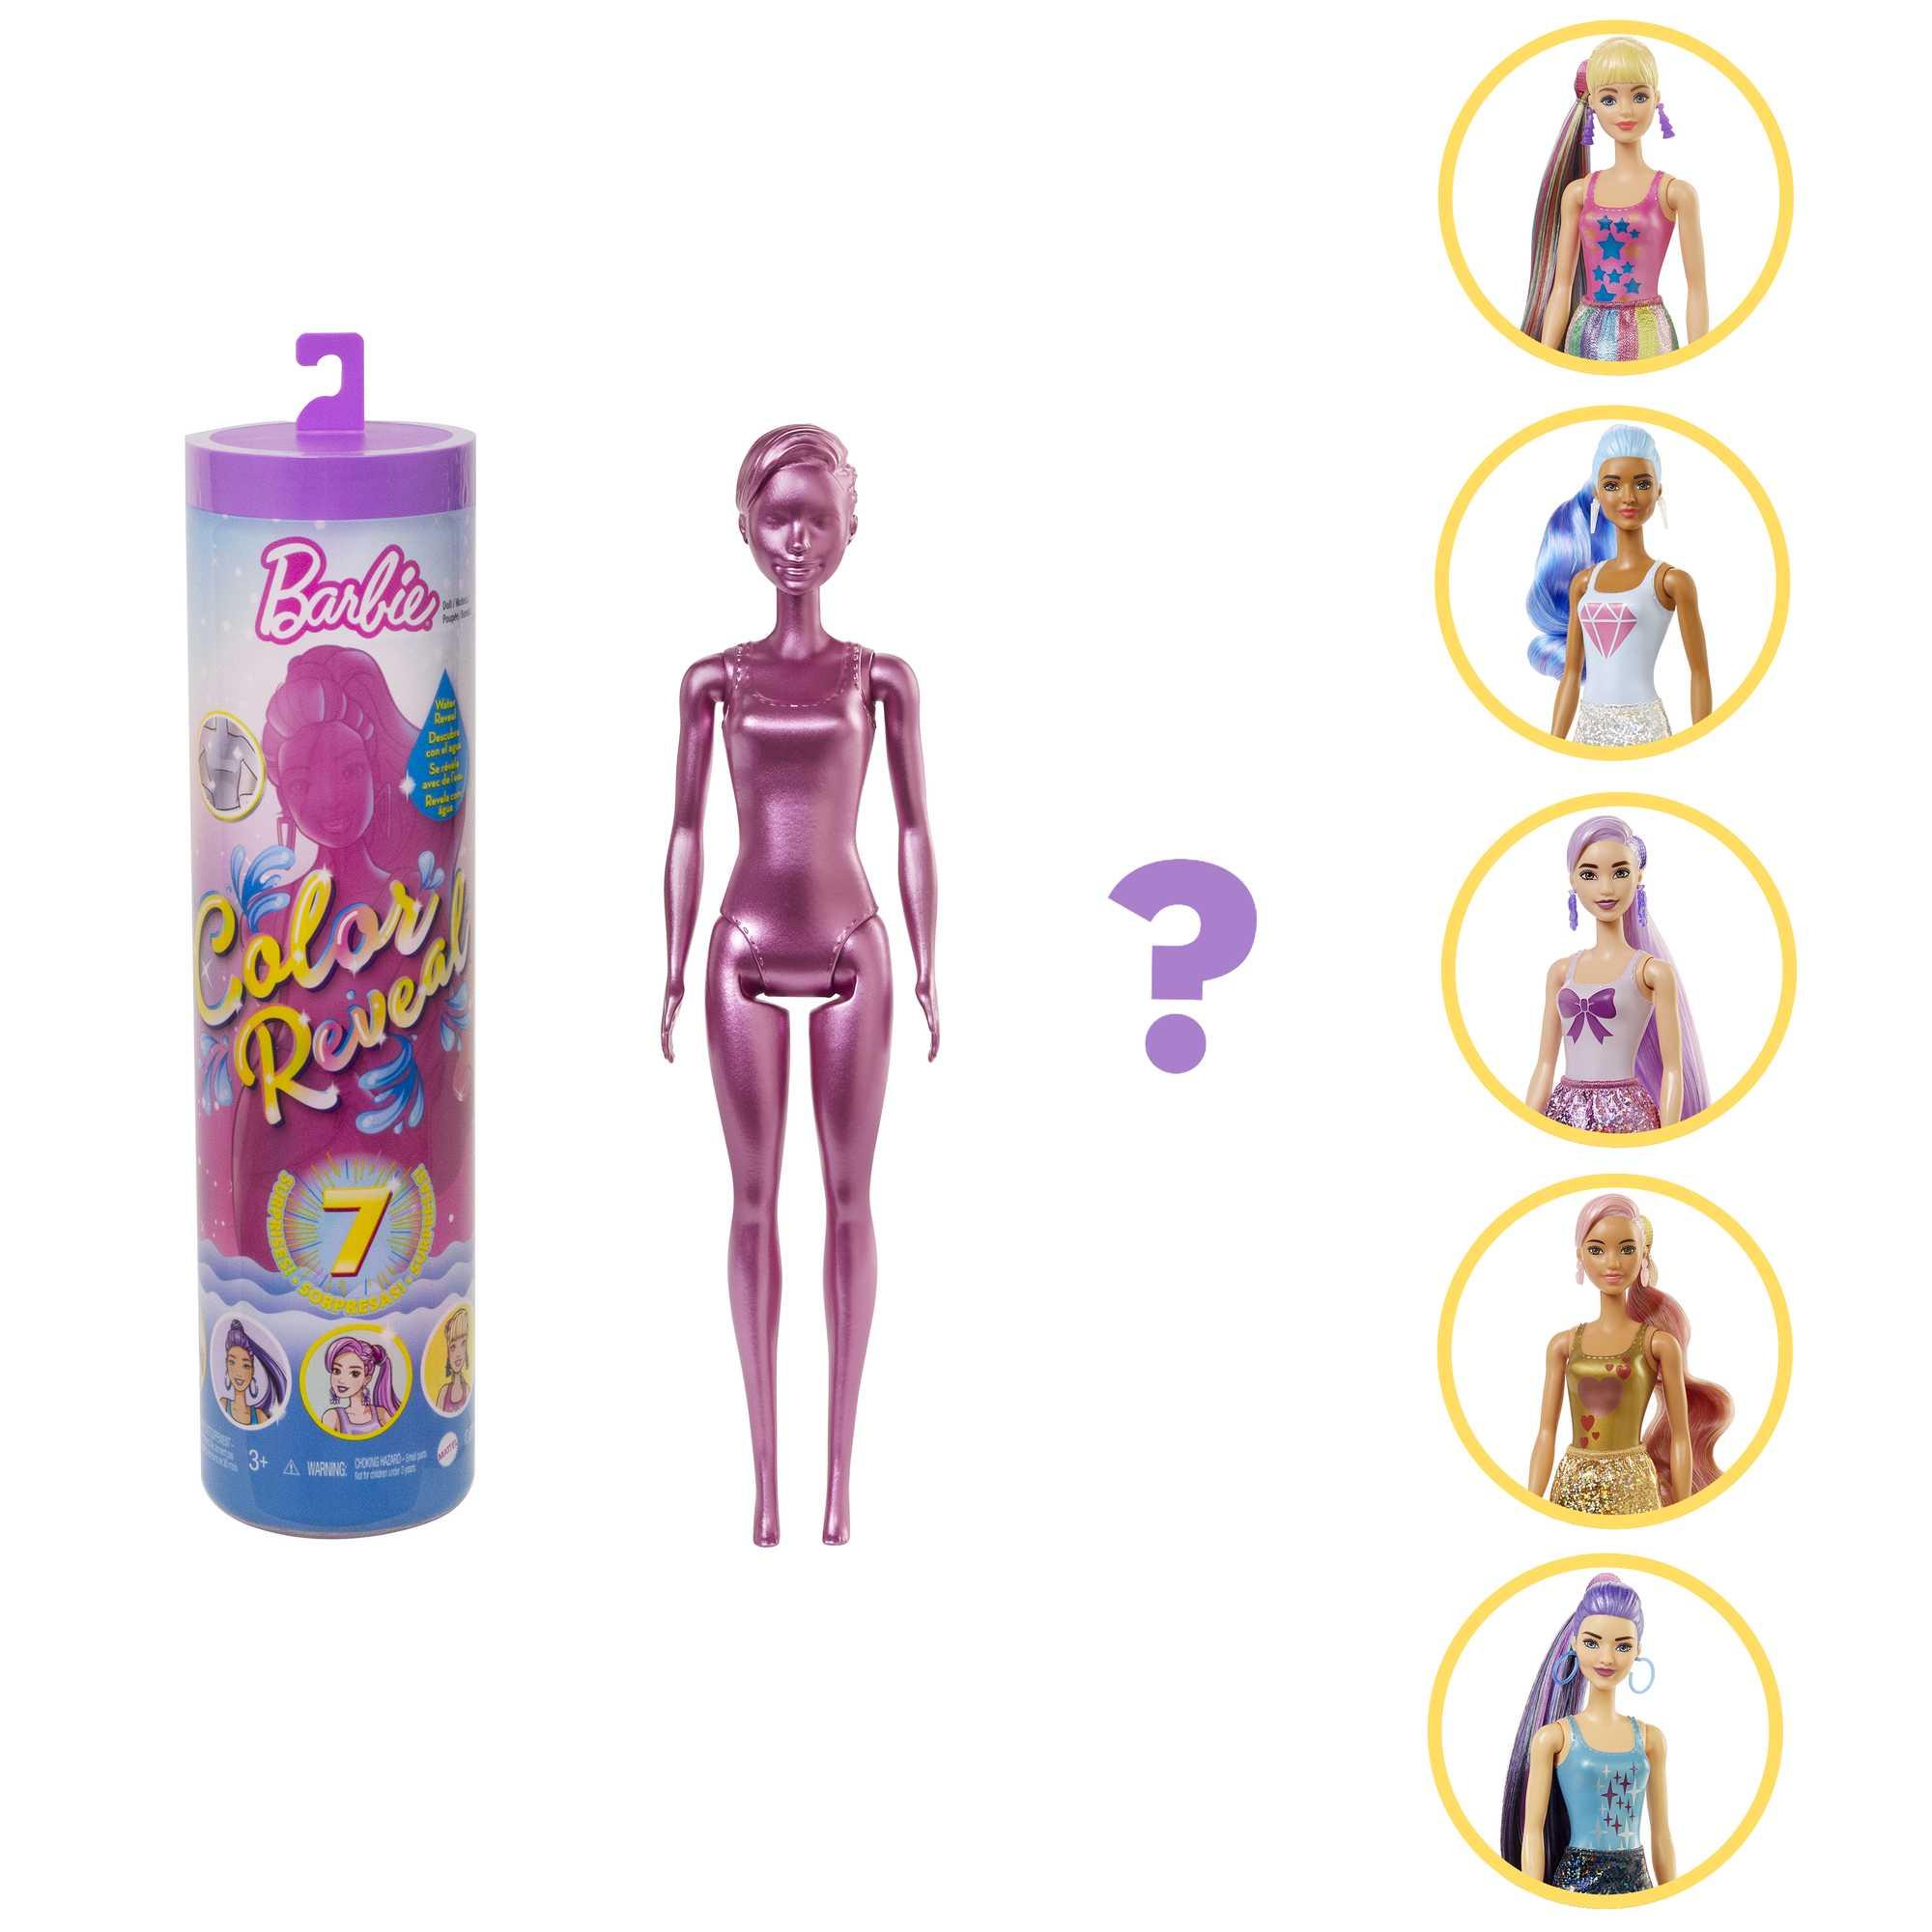 barbie color reveal serie metallic, bambola con 7 sorprese, assortimento casuale, 3+anni - Barbie